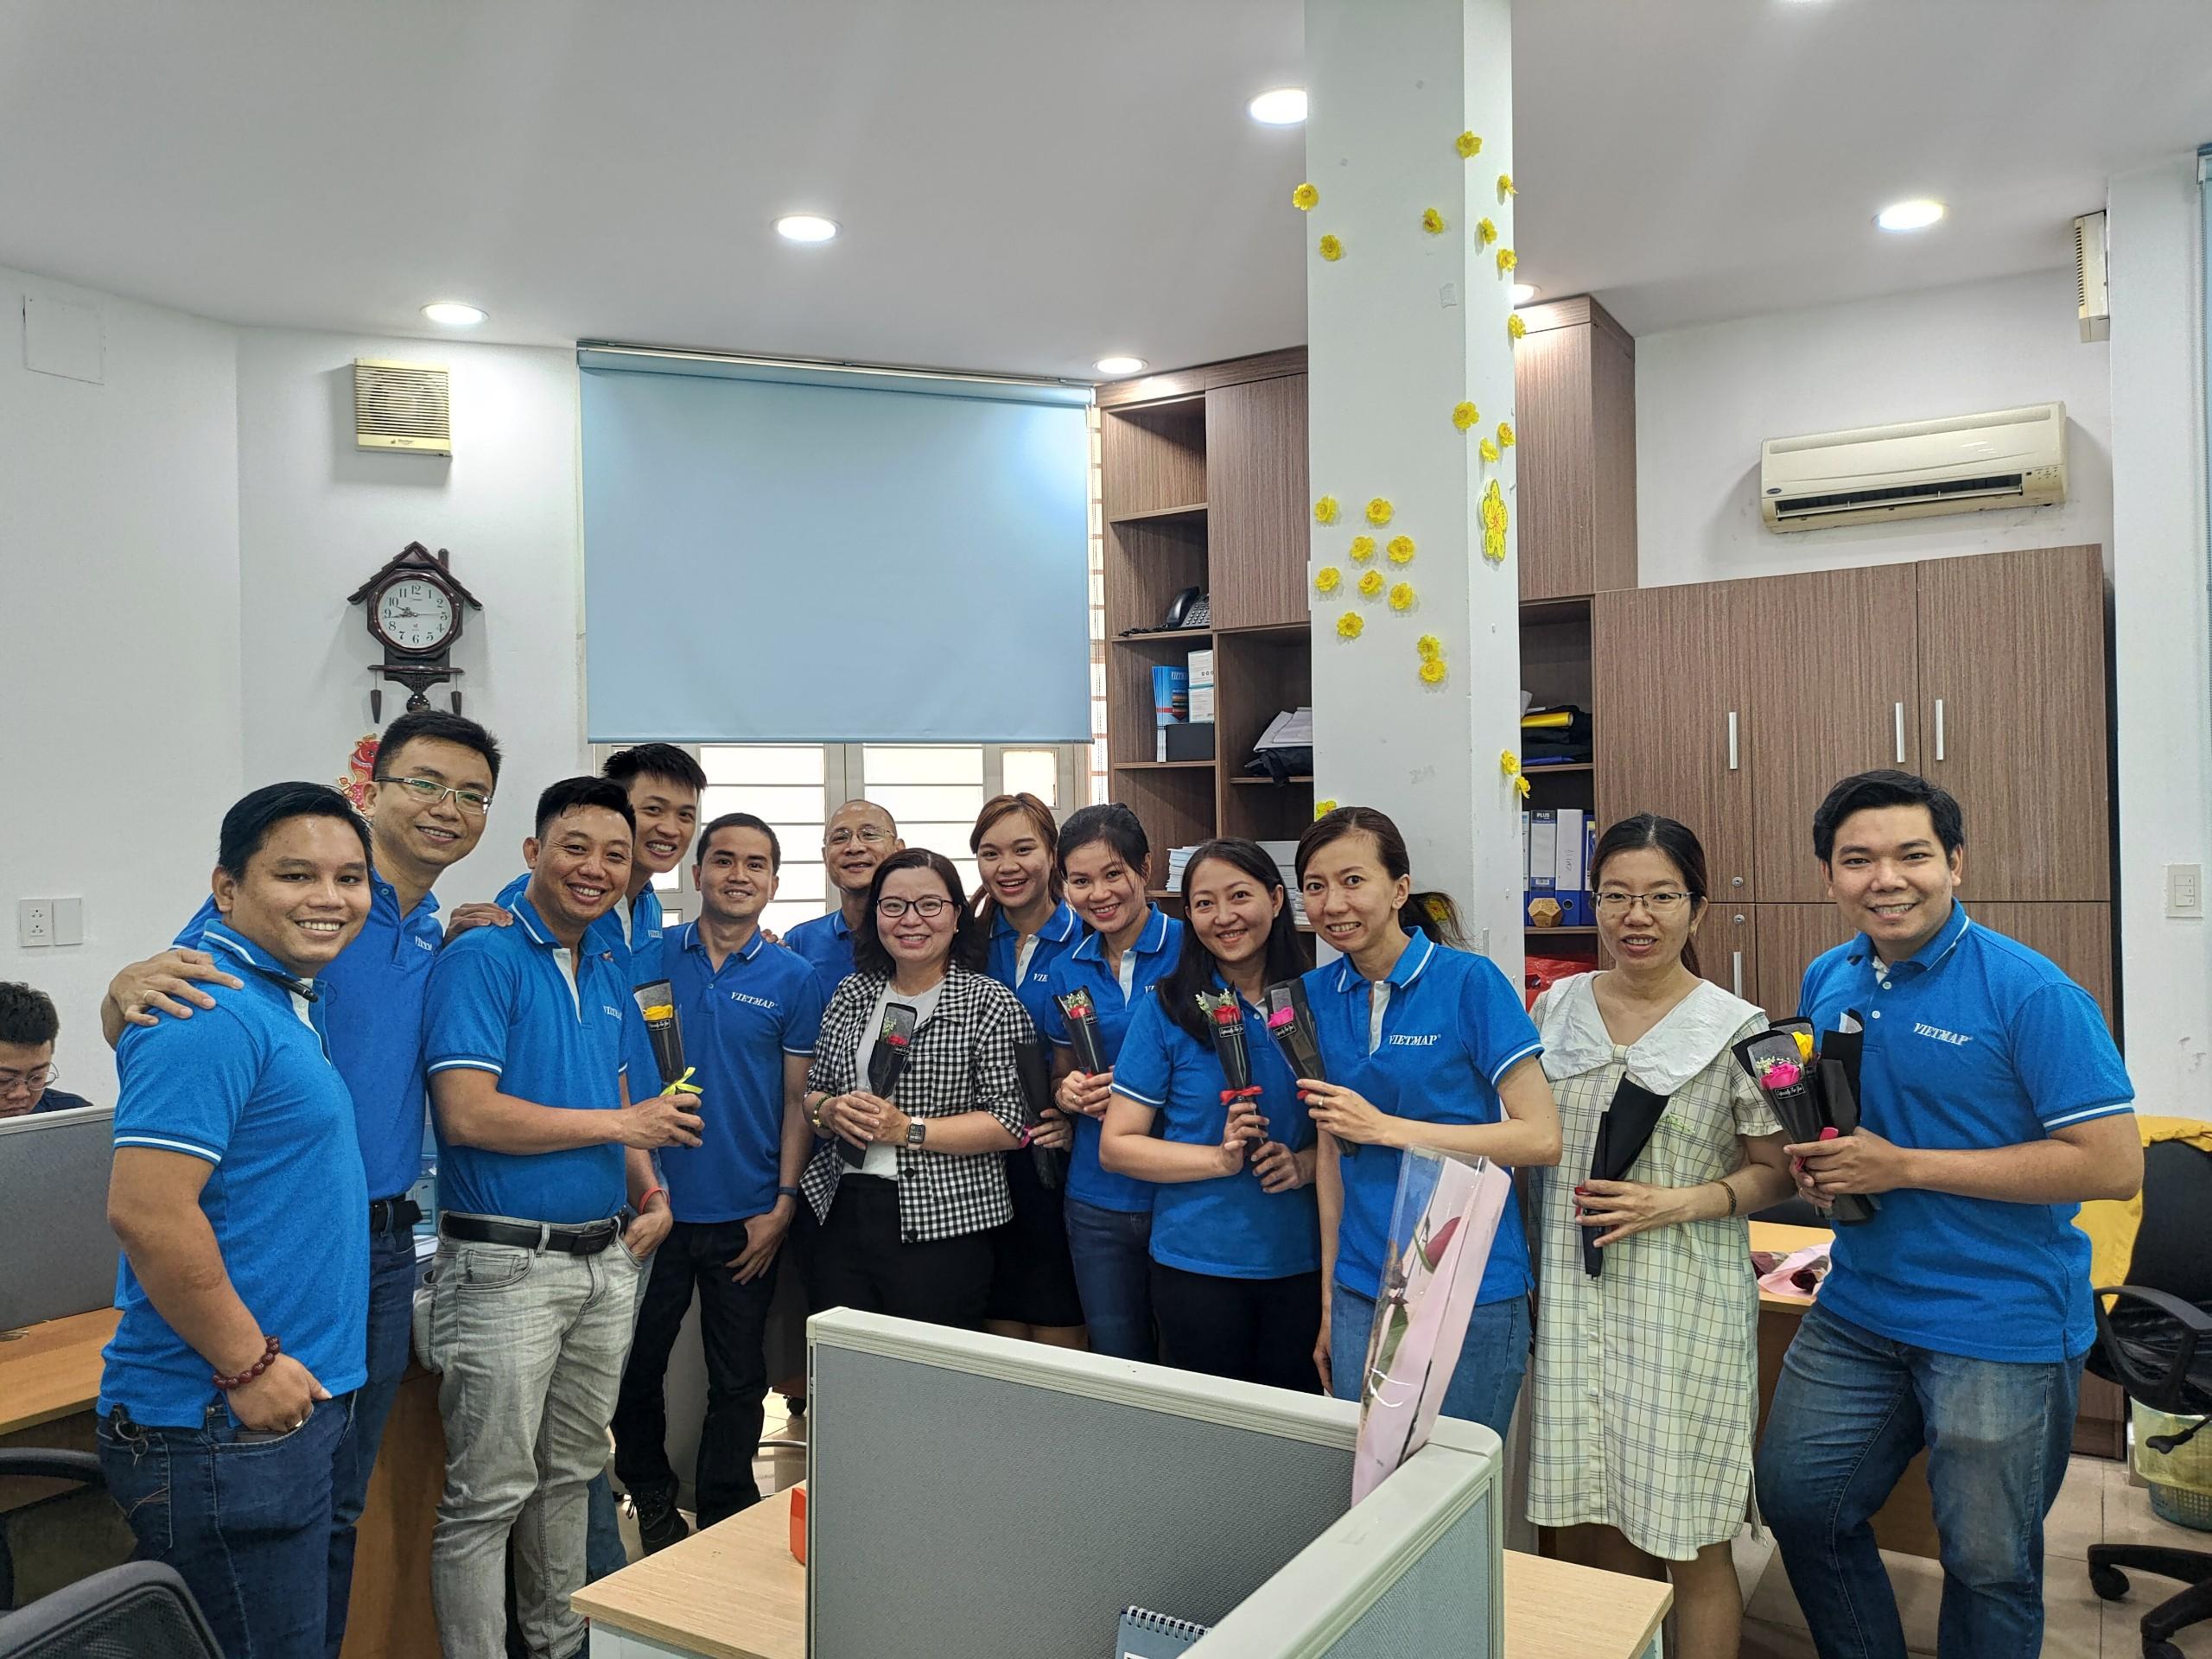 MicrosoftTeams-image (1) - nhi phi.png